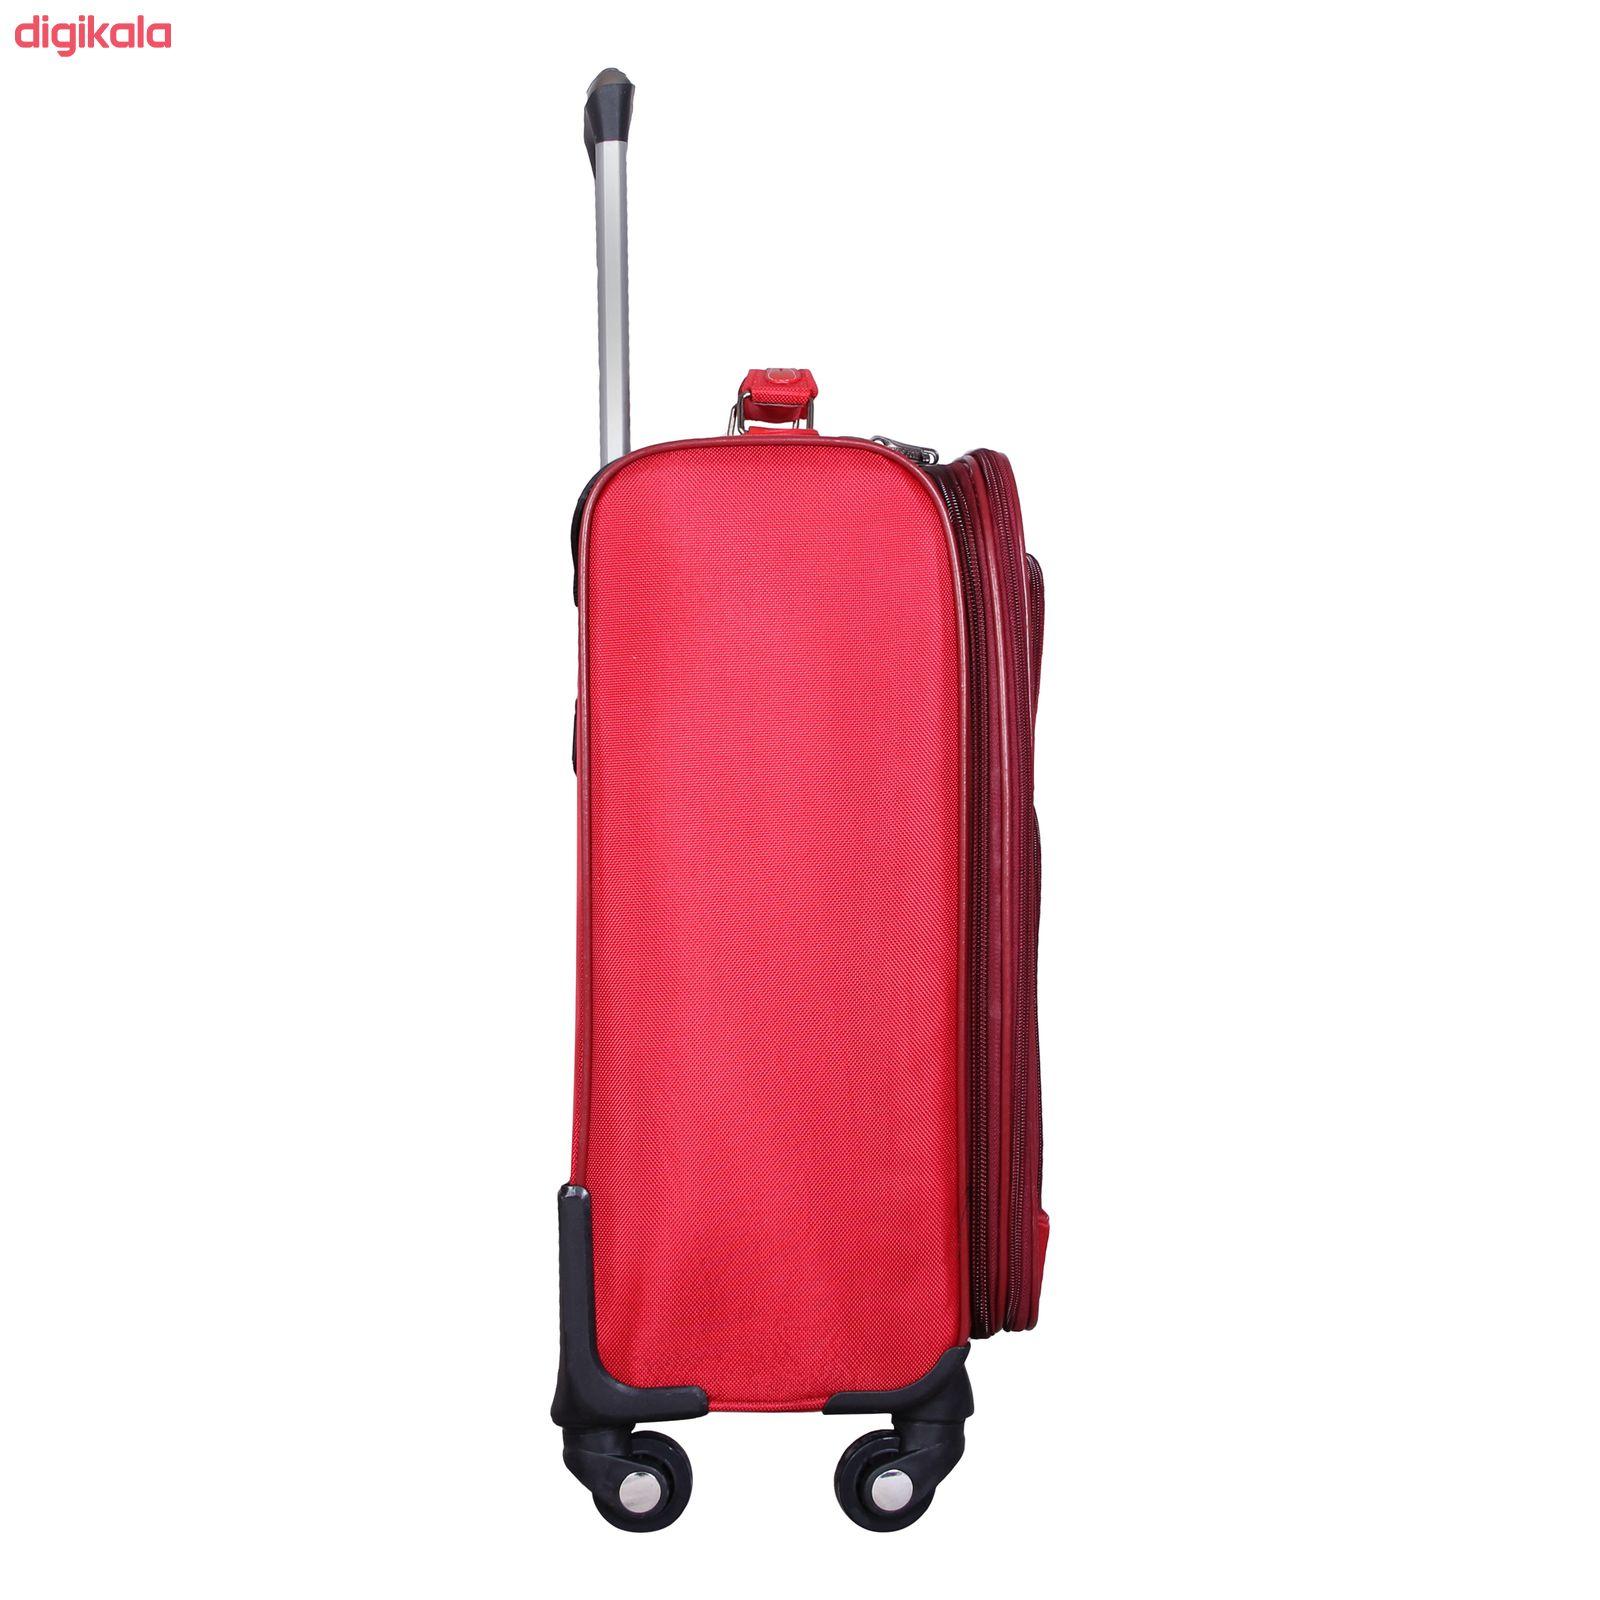 مجموعه سه عددی چمدان کدA1034 main 1 9